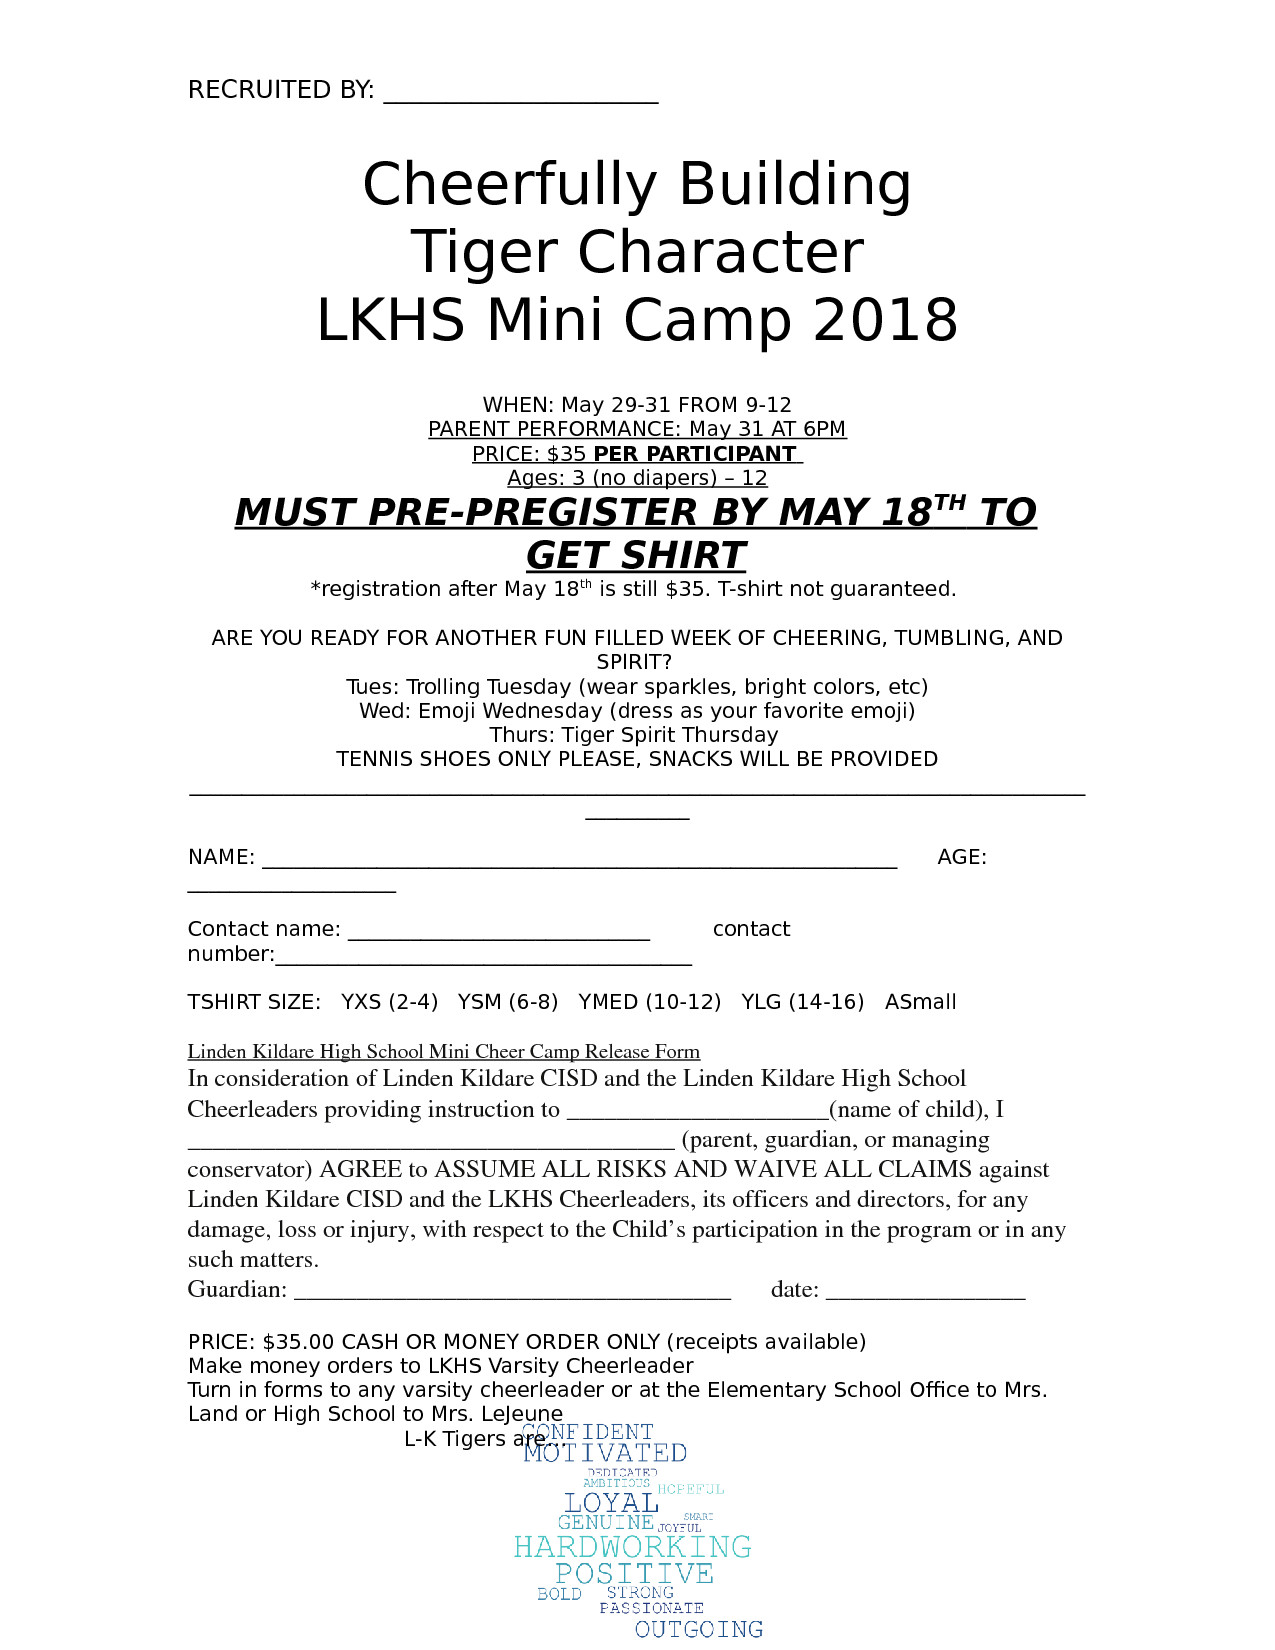 Mini Cheer Camp Info